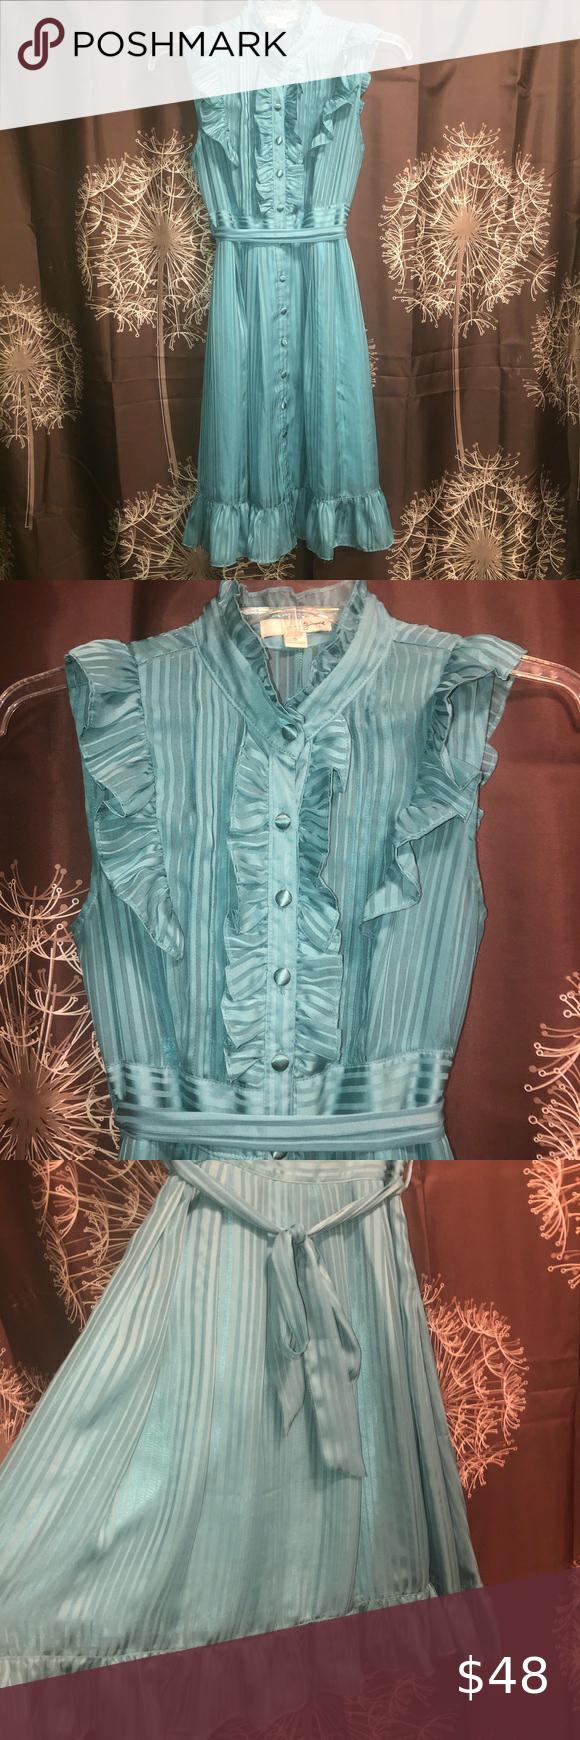 Twentyone Green Spring Ruffle Dress Vintage Style Vintage Dresses Vintage Fashion Lace Top Dress [ 1740 x 580 Pixel ]